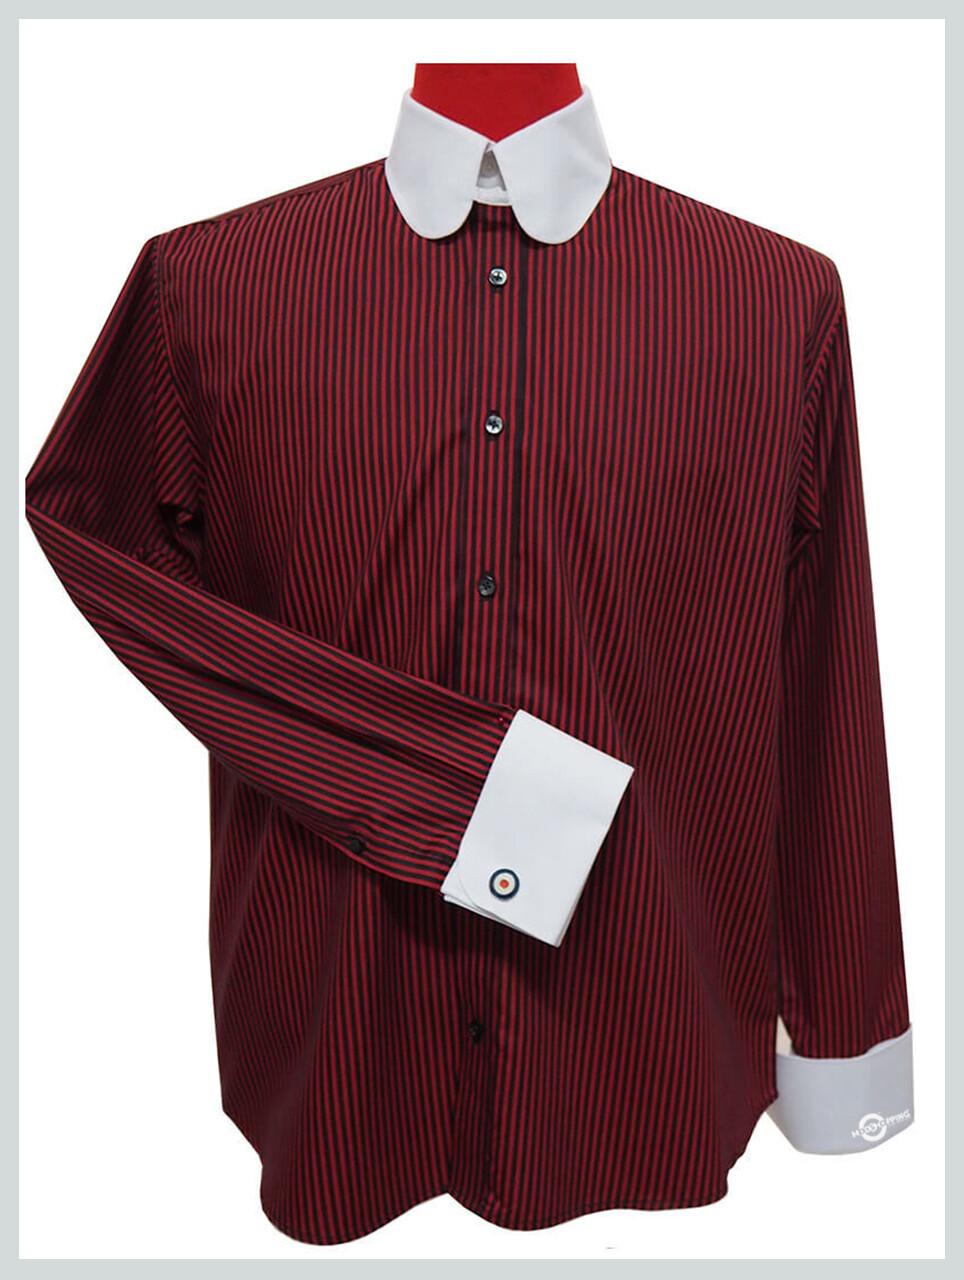 Tab Collar Shirt| Burgundy & Black Stripe Wedding Shirt